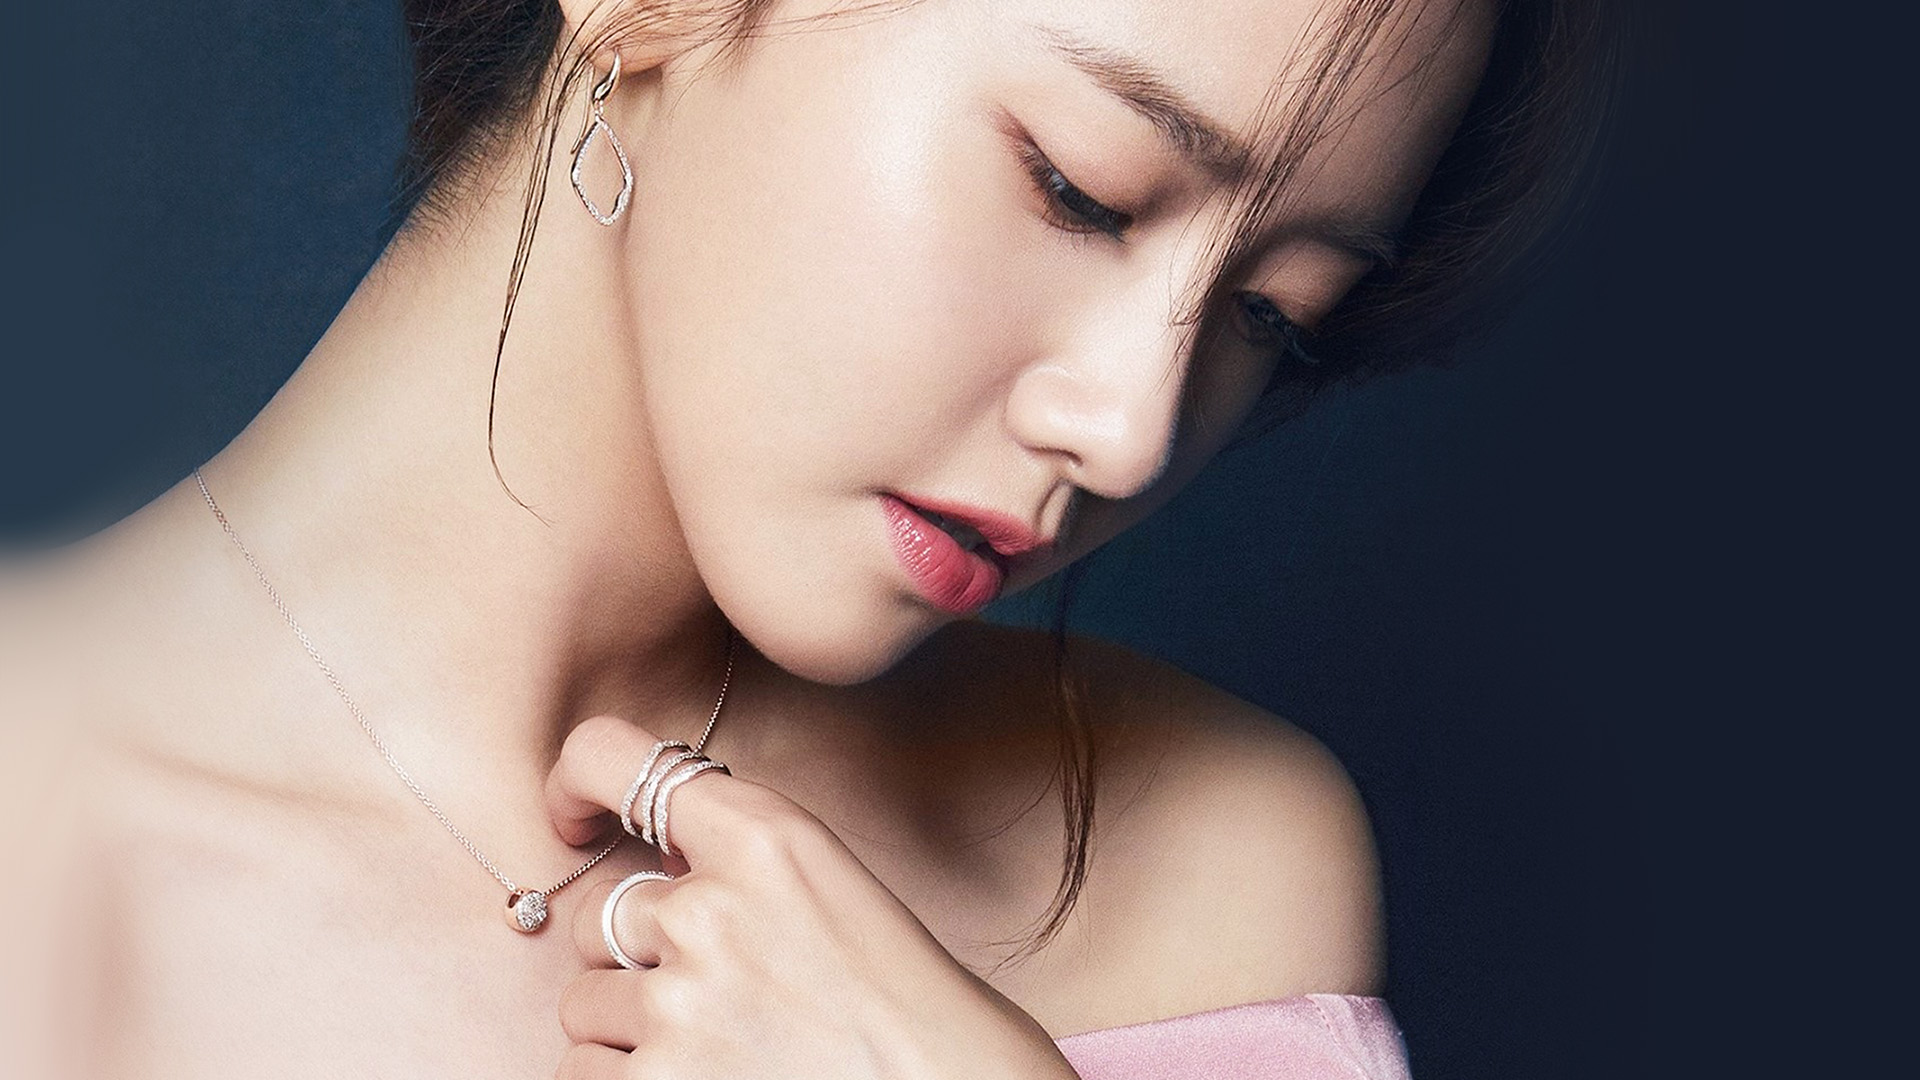 Hl48 kpop yuna girl blue wallpaper - Yuna wallpaper ...